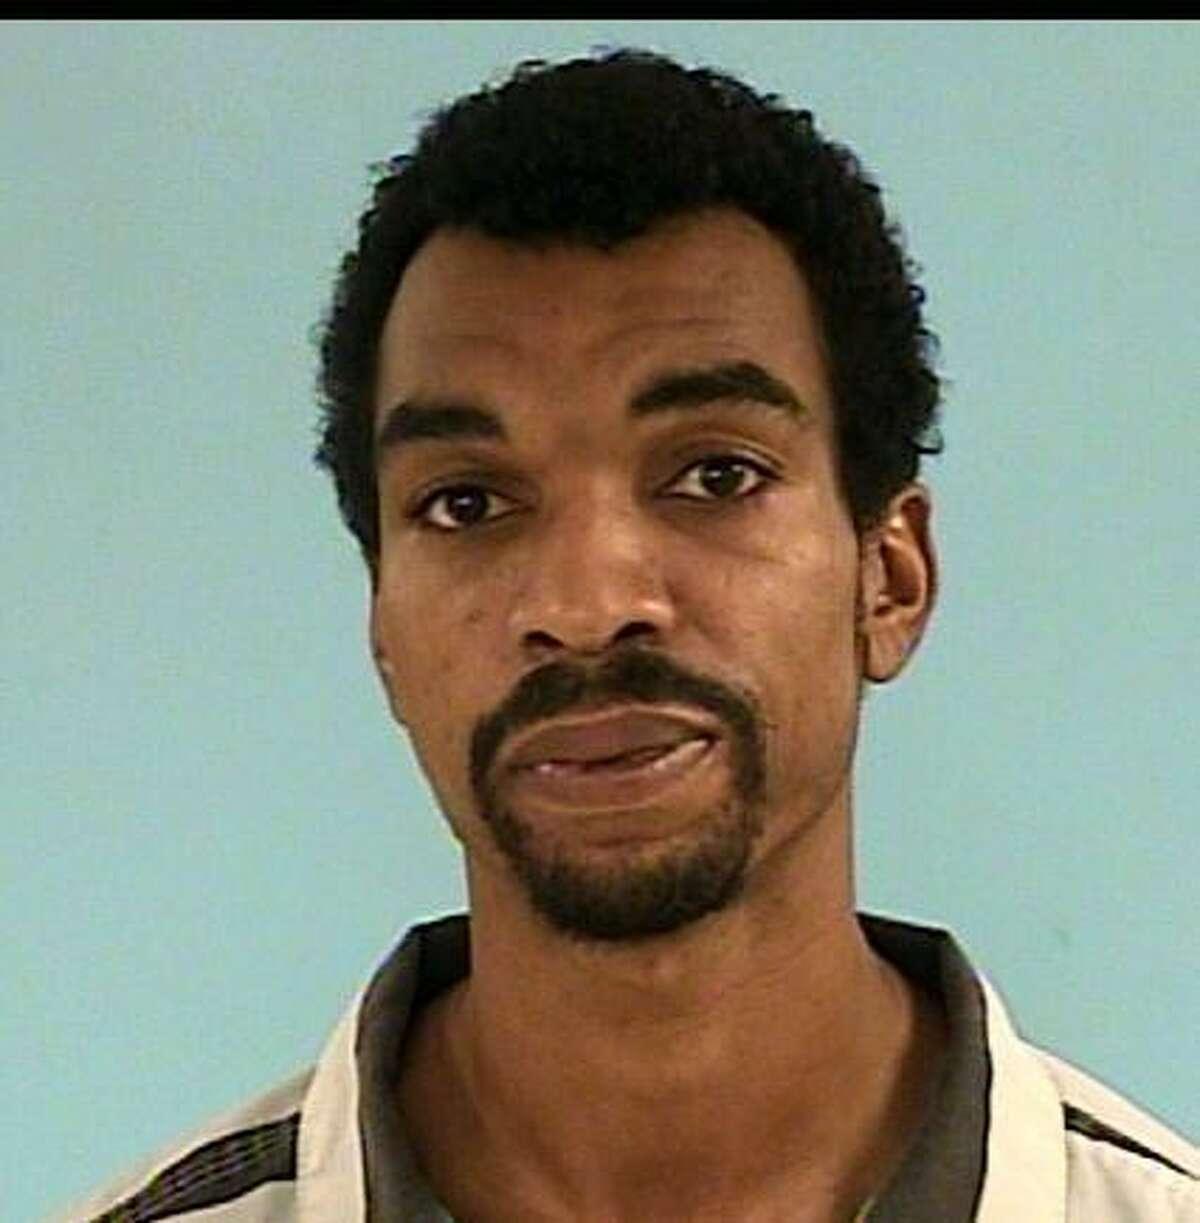 "GAFFORD, Johnathan LeondreBlack/Male DOB: 01/03/1981Height: 6'01"" Weight: 175 lbs.Hair: Black Eyes: BrownWarrant: # 120505604 Order of ArrestTheftLKA: Heathmeadow., Spring."